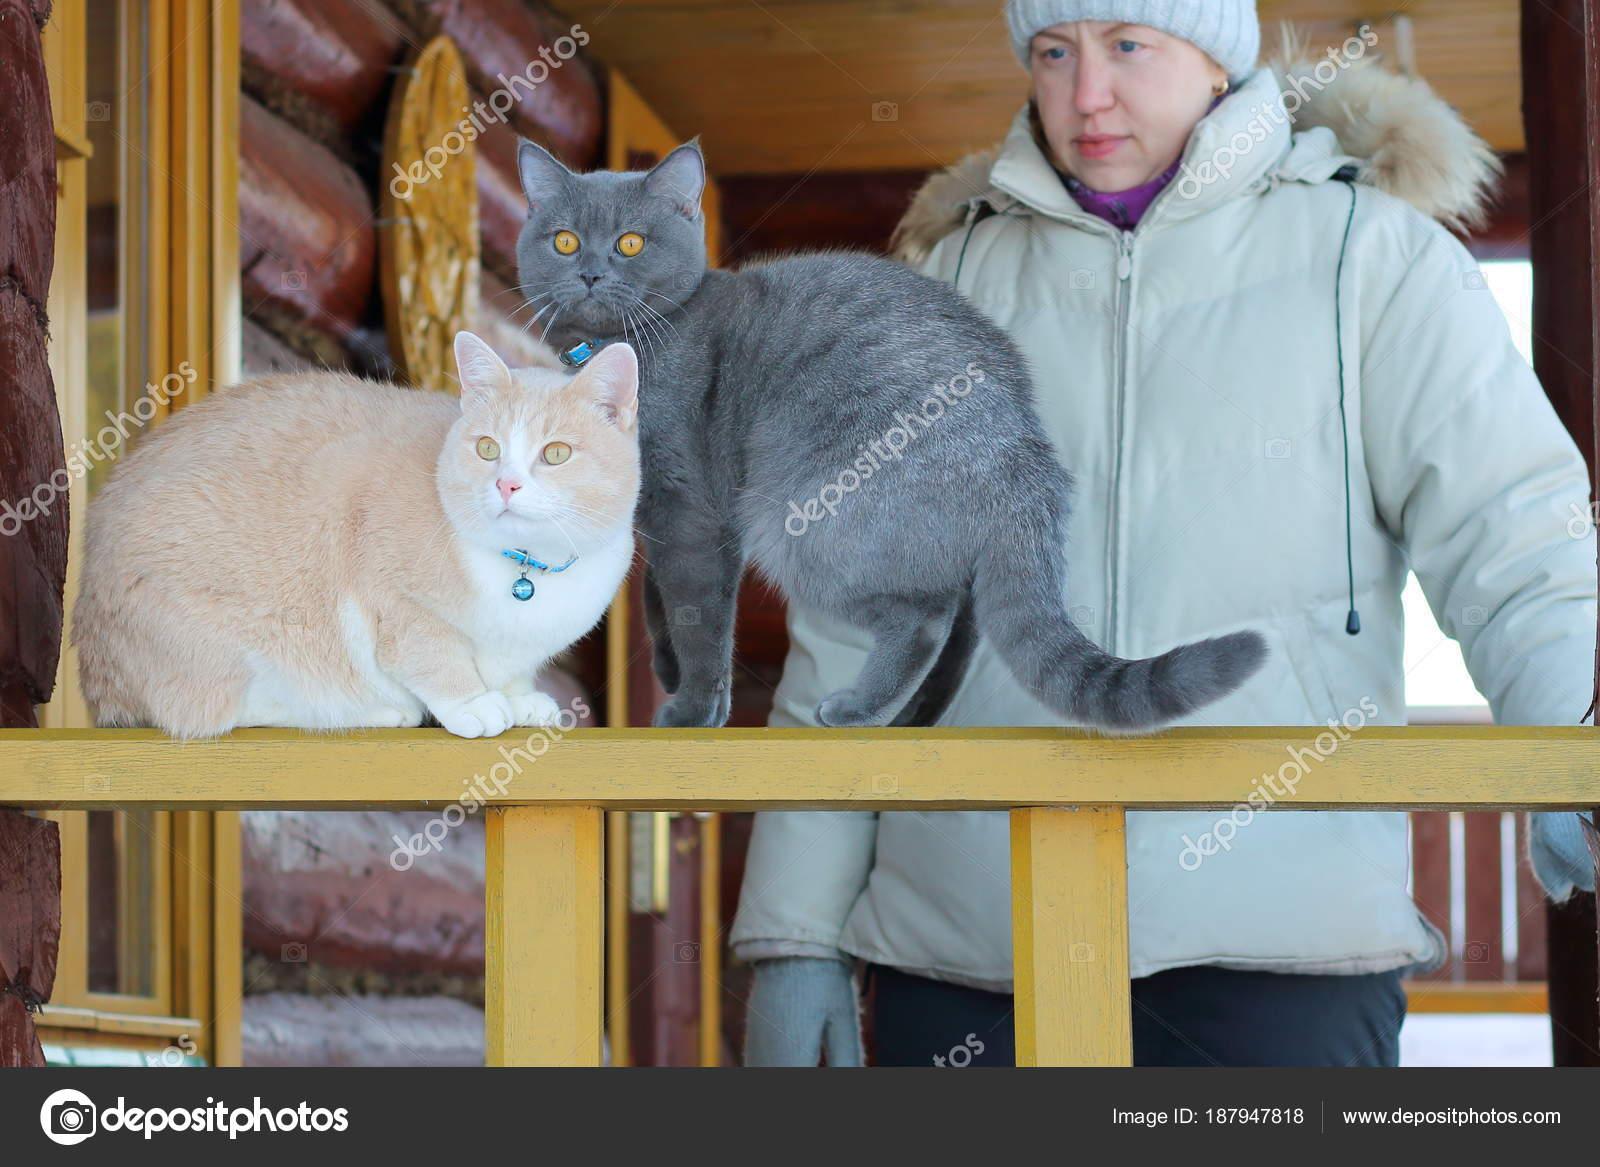 d9461bec5d87 Κόκκινο και γκρι γάτες στη βεράντα του ένα ξύλινο σπίτι με την  οικοδέσποινα– εικόνα αρχείου